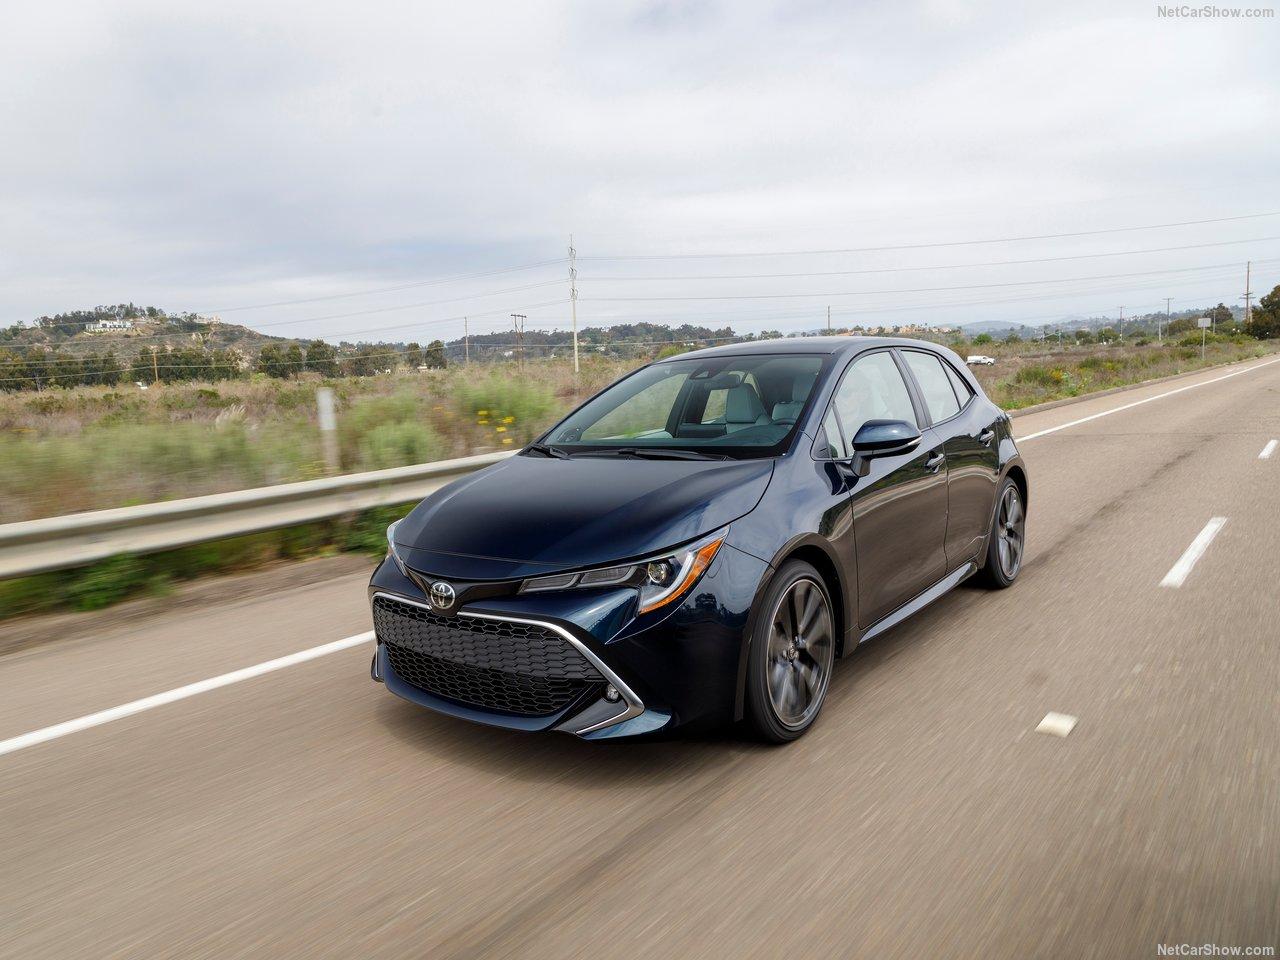 Toyota-Corolla_Hatchback-2019-1280-0c.jpg